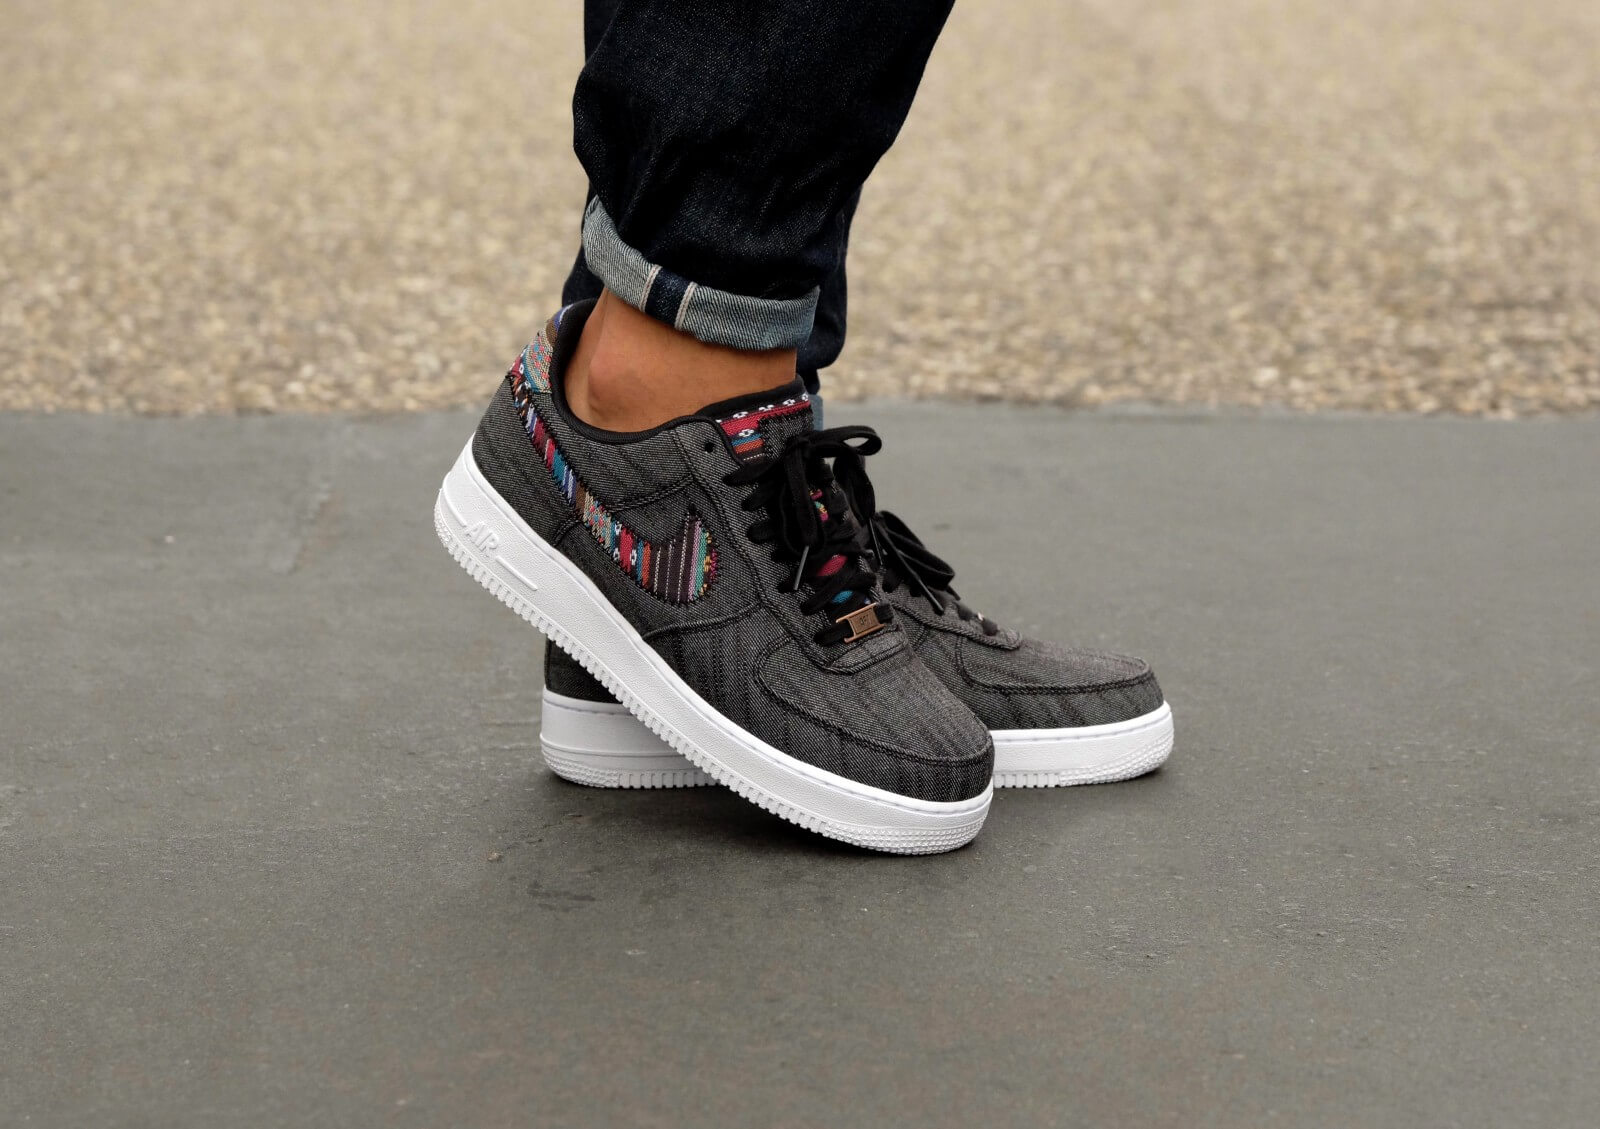 Nike Air Force 1 07 Lv8 823511 001 Blackwhite